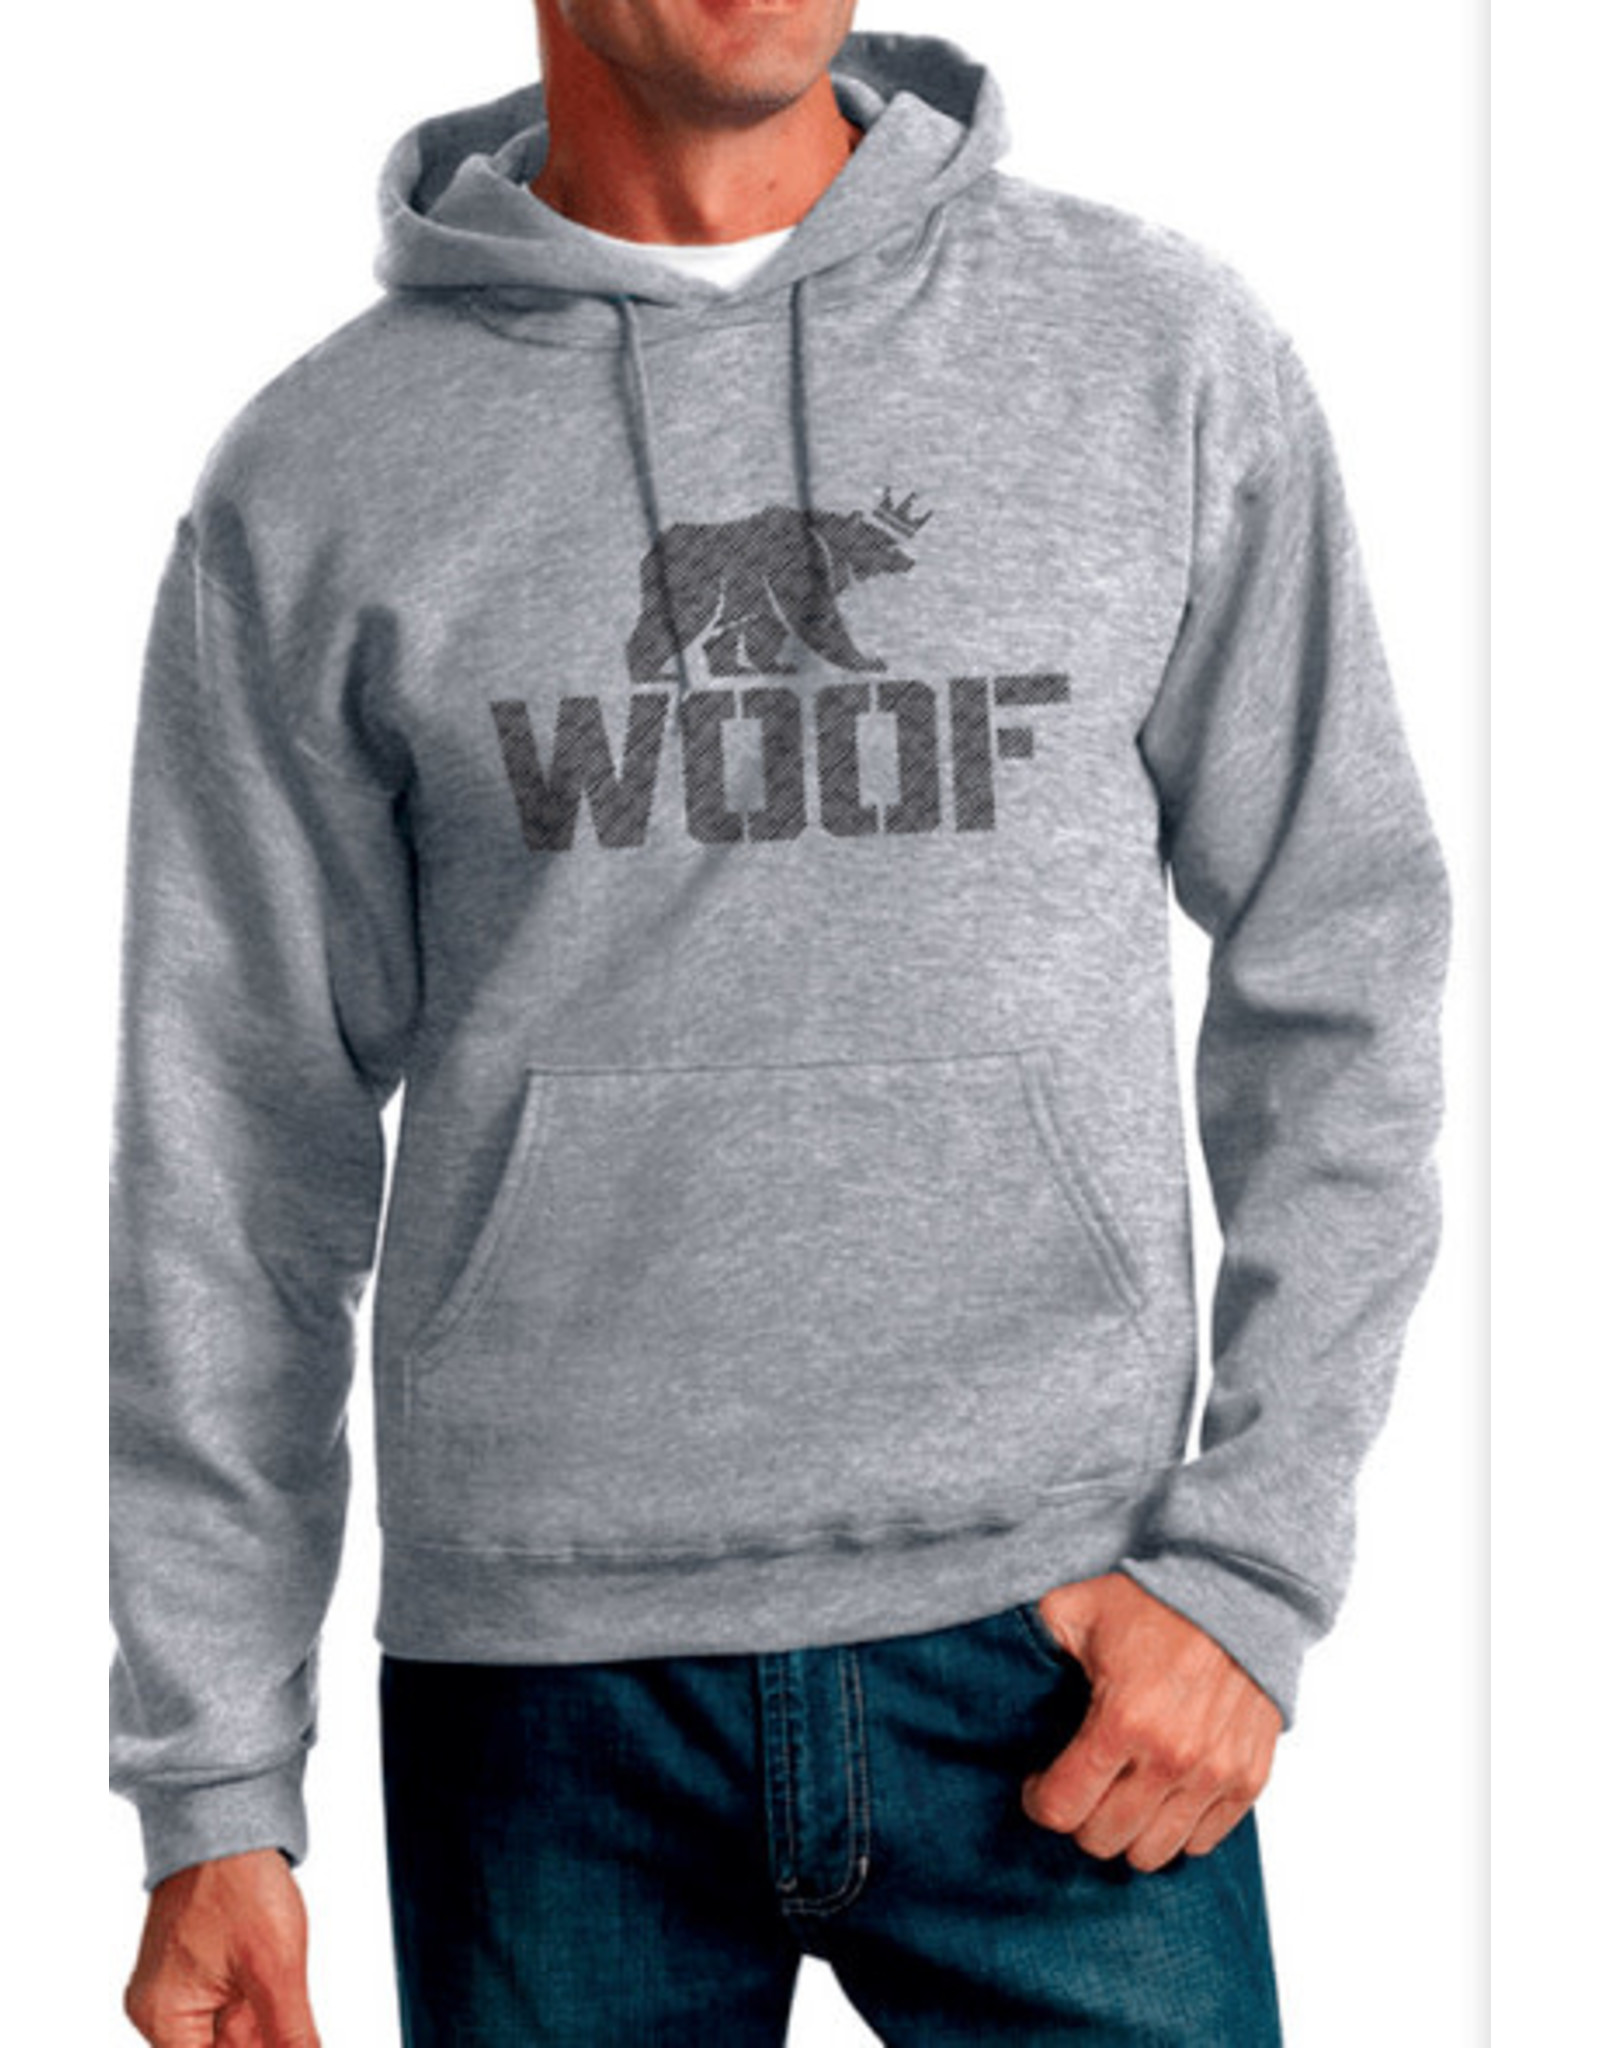 ajaxx63 ajaxx63 Woof Hoodie